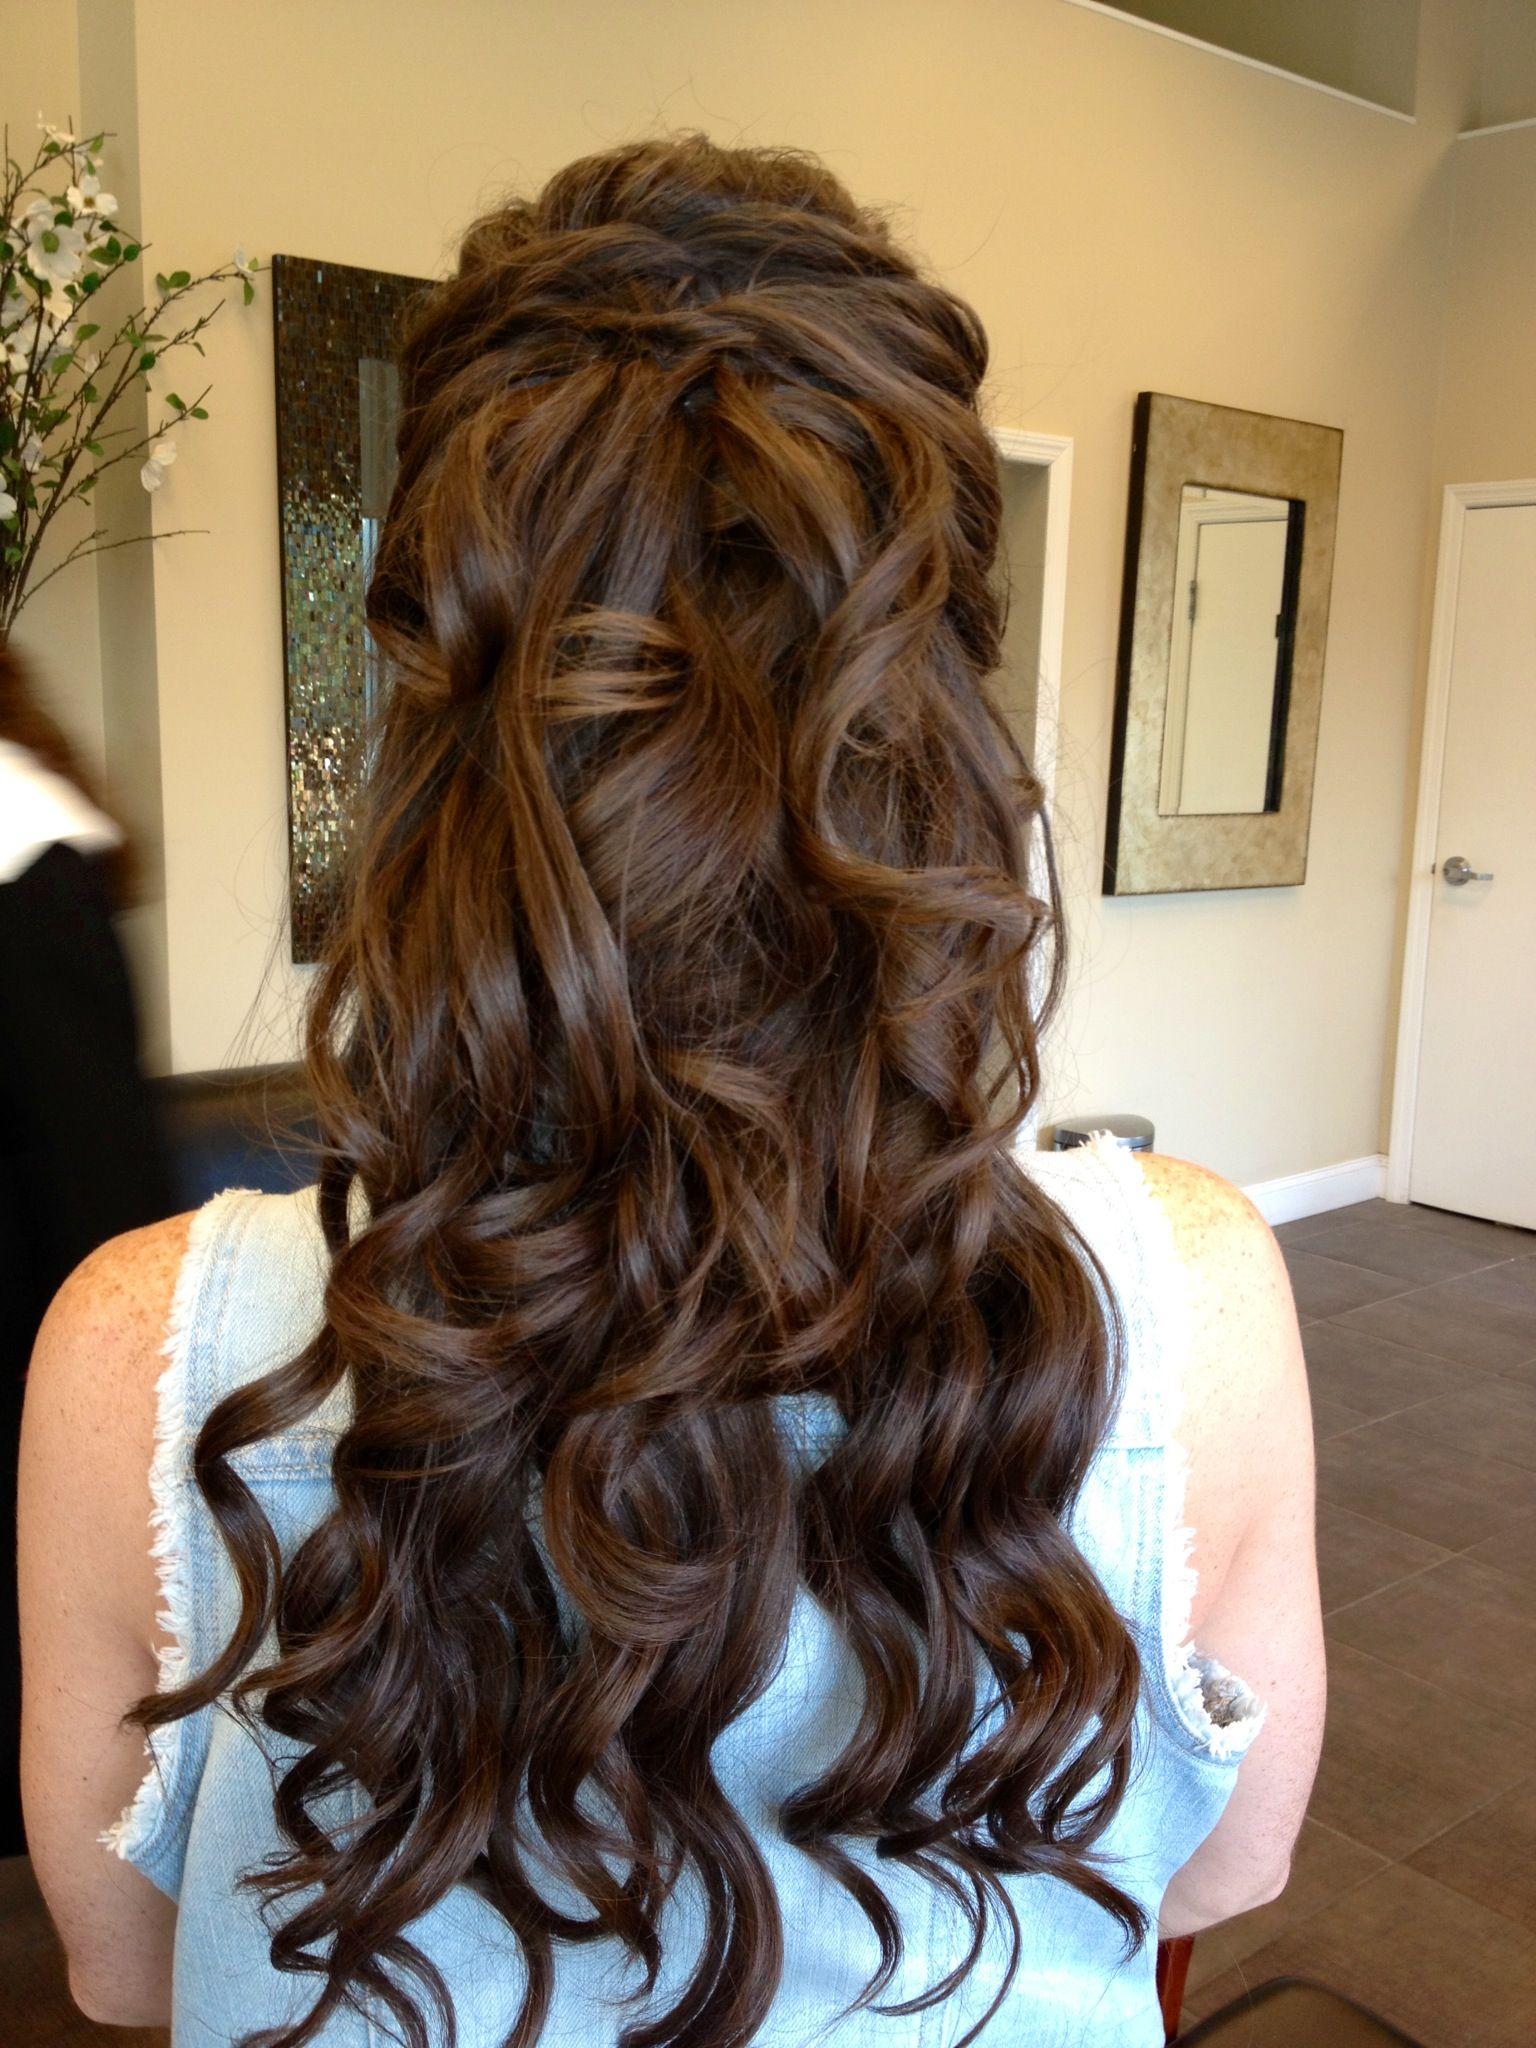 Long wedding hair trial hair pinterest peinados y boda